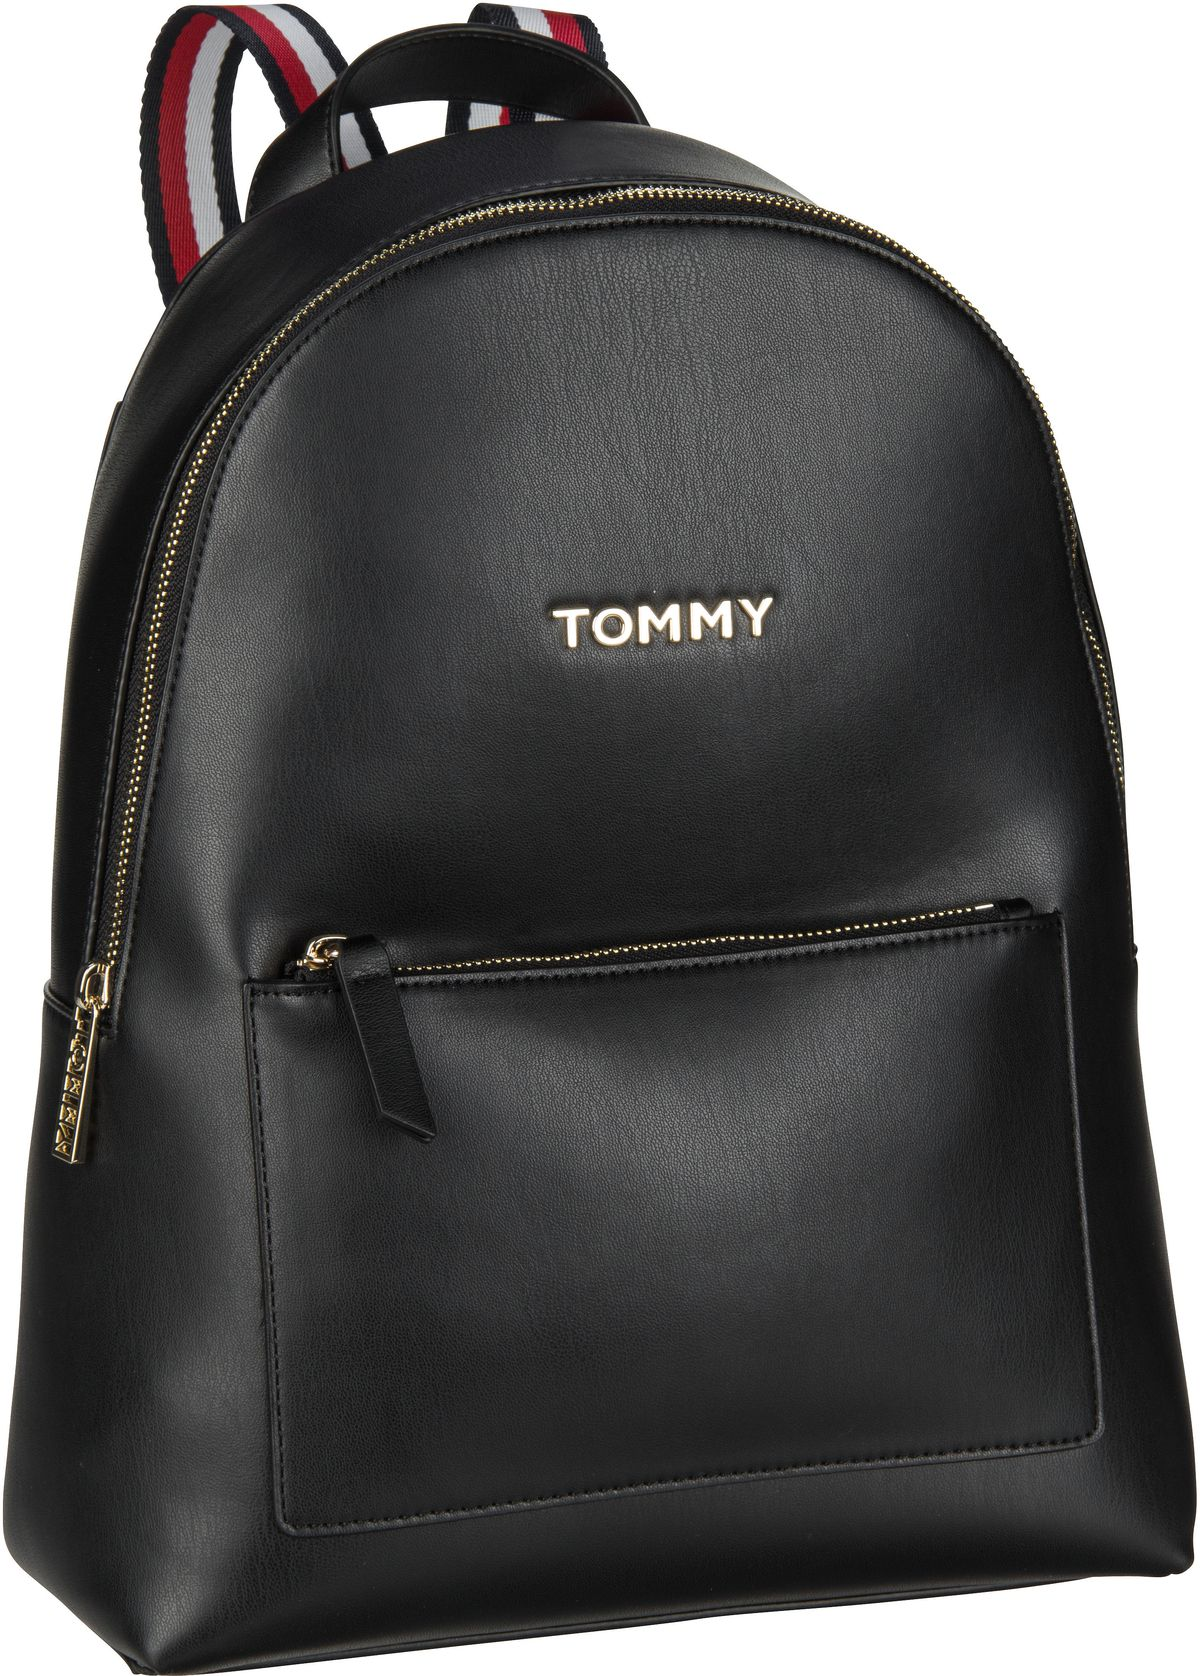 Rucksack / Daypack Iconic Tommy Backpack Black